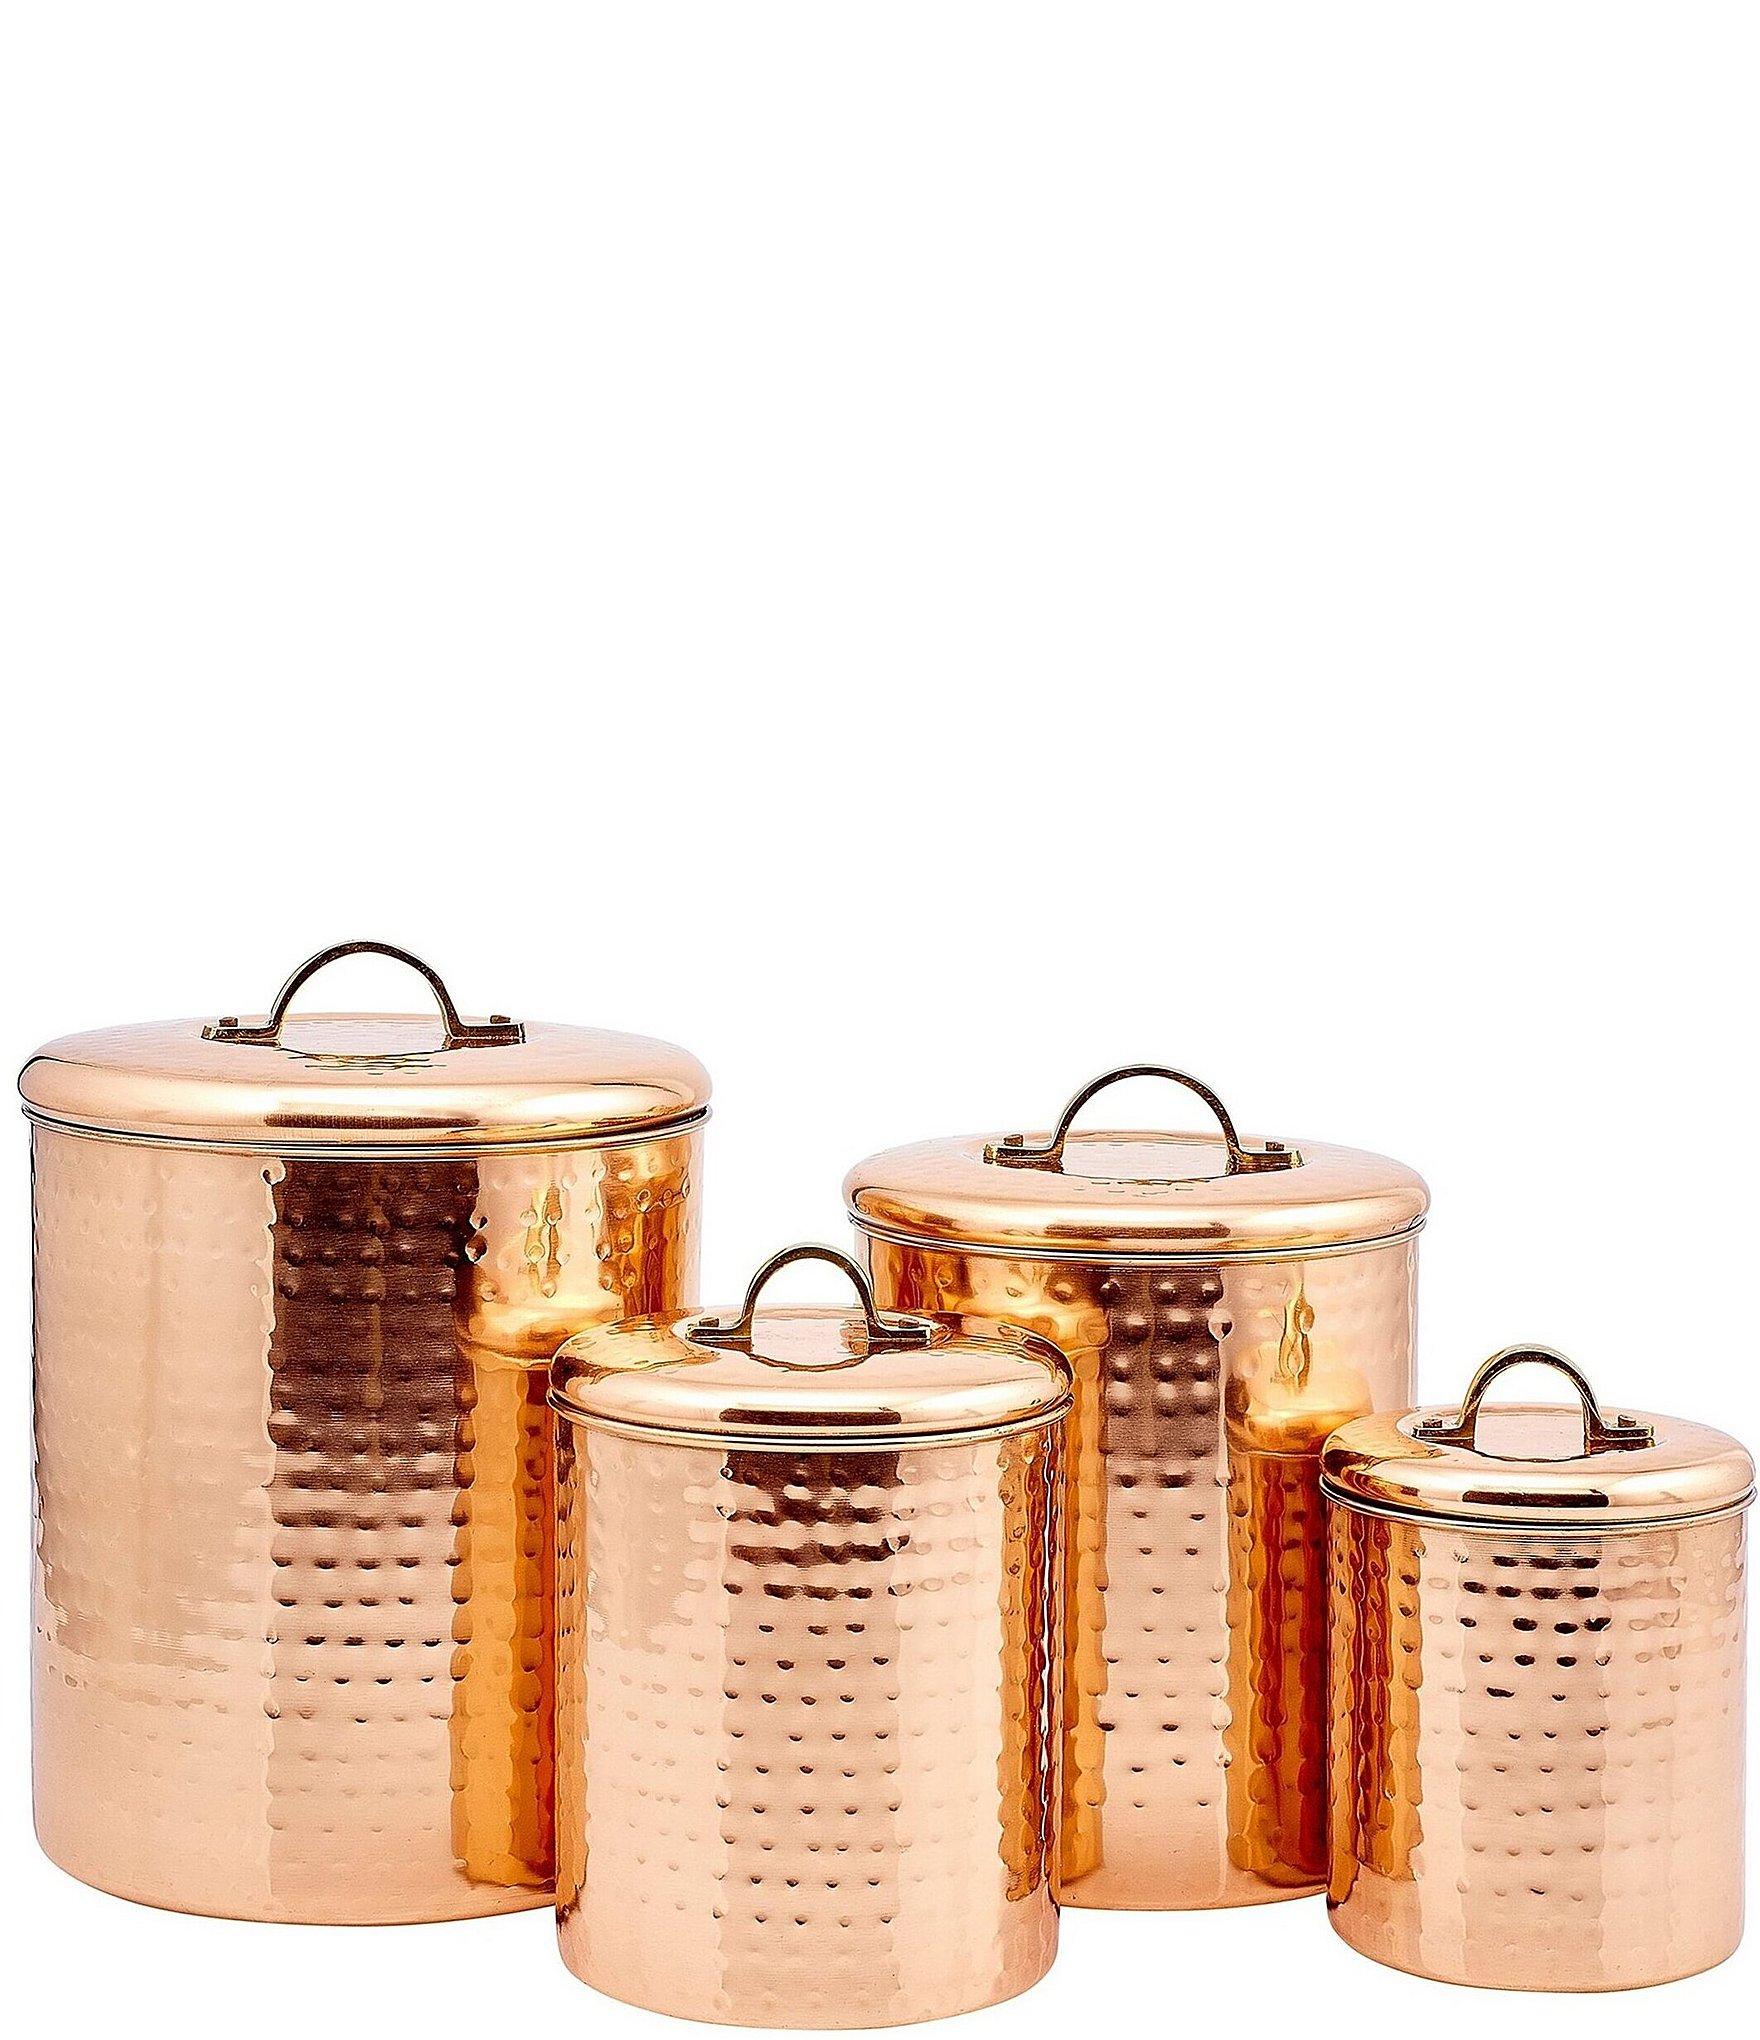 canister sets: Home: Kitchen, Dining & Bedding | Dillards.com